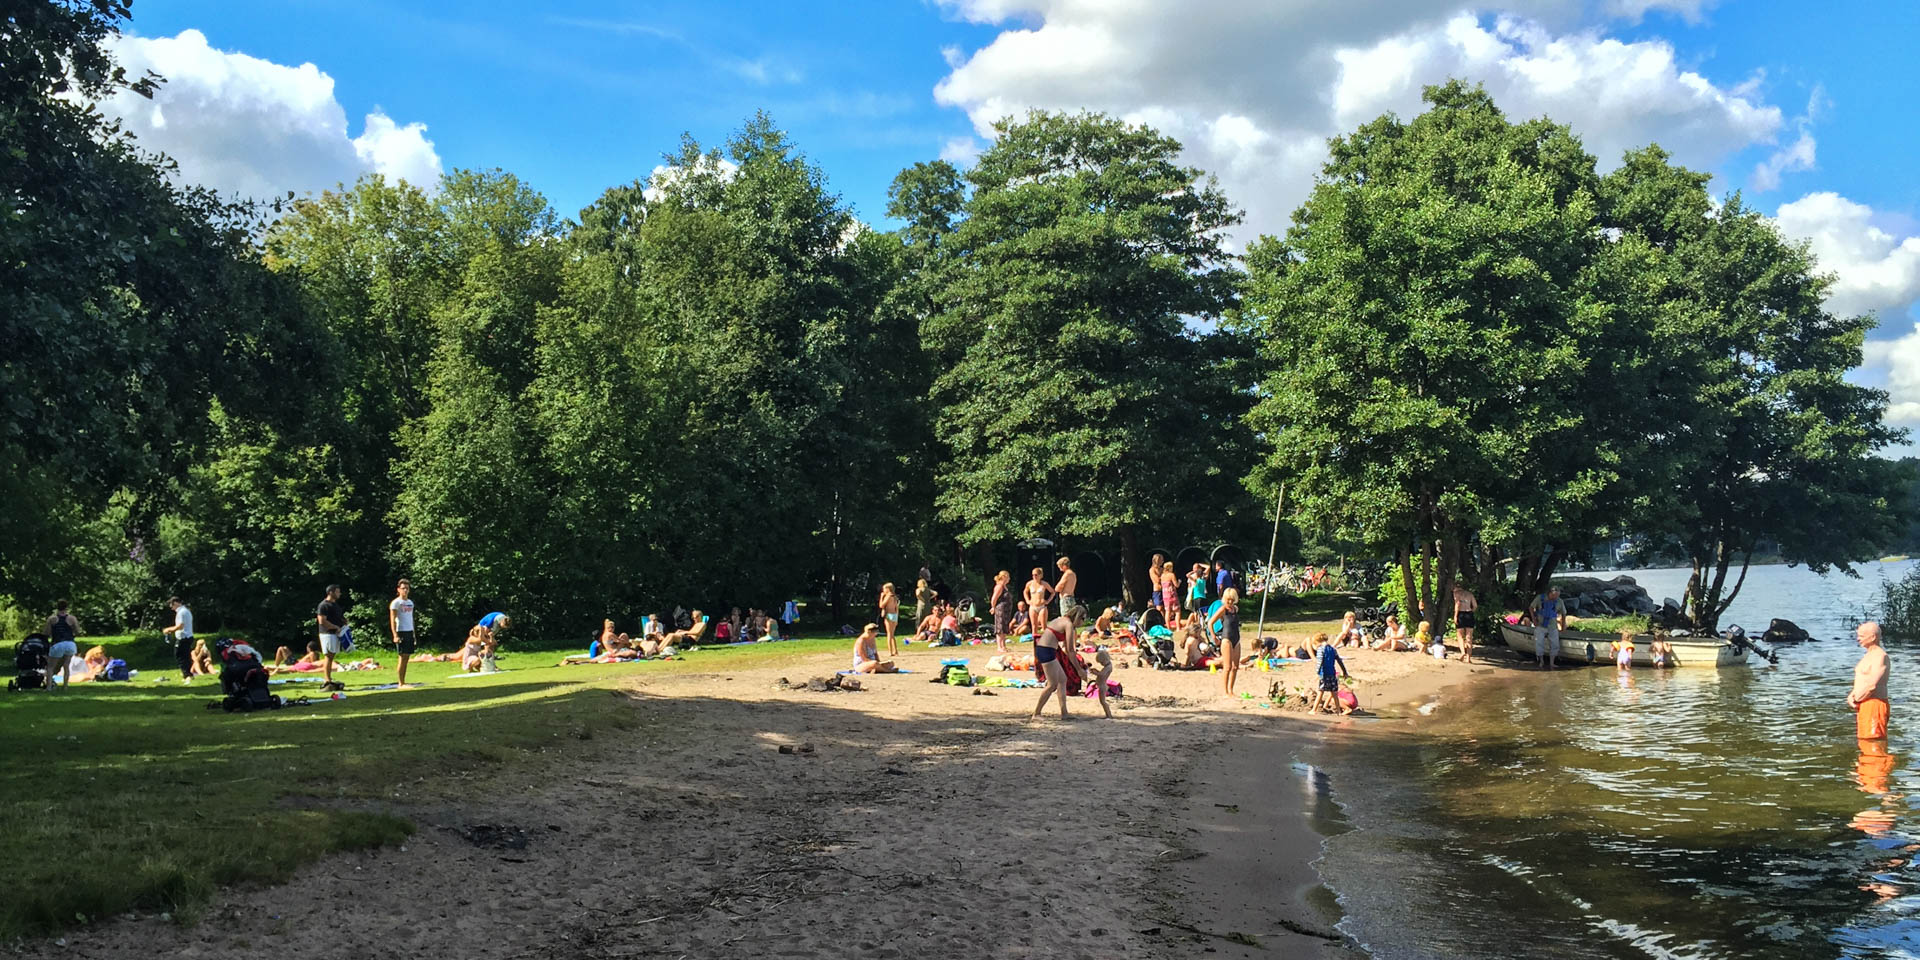 Ekhagens Strandbad 2015